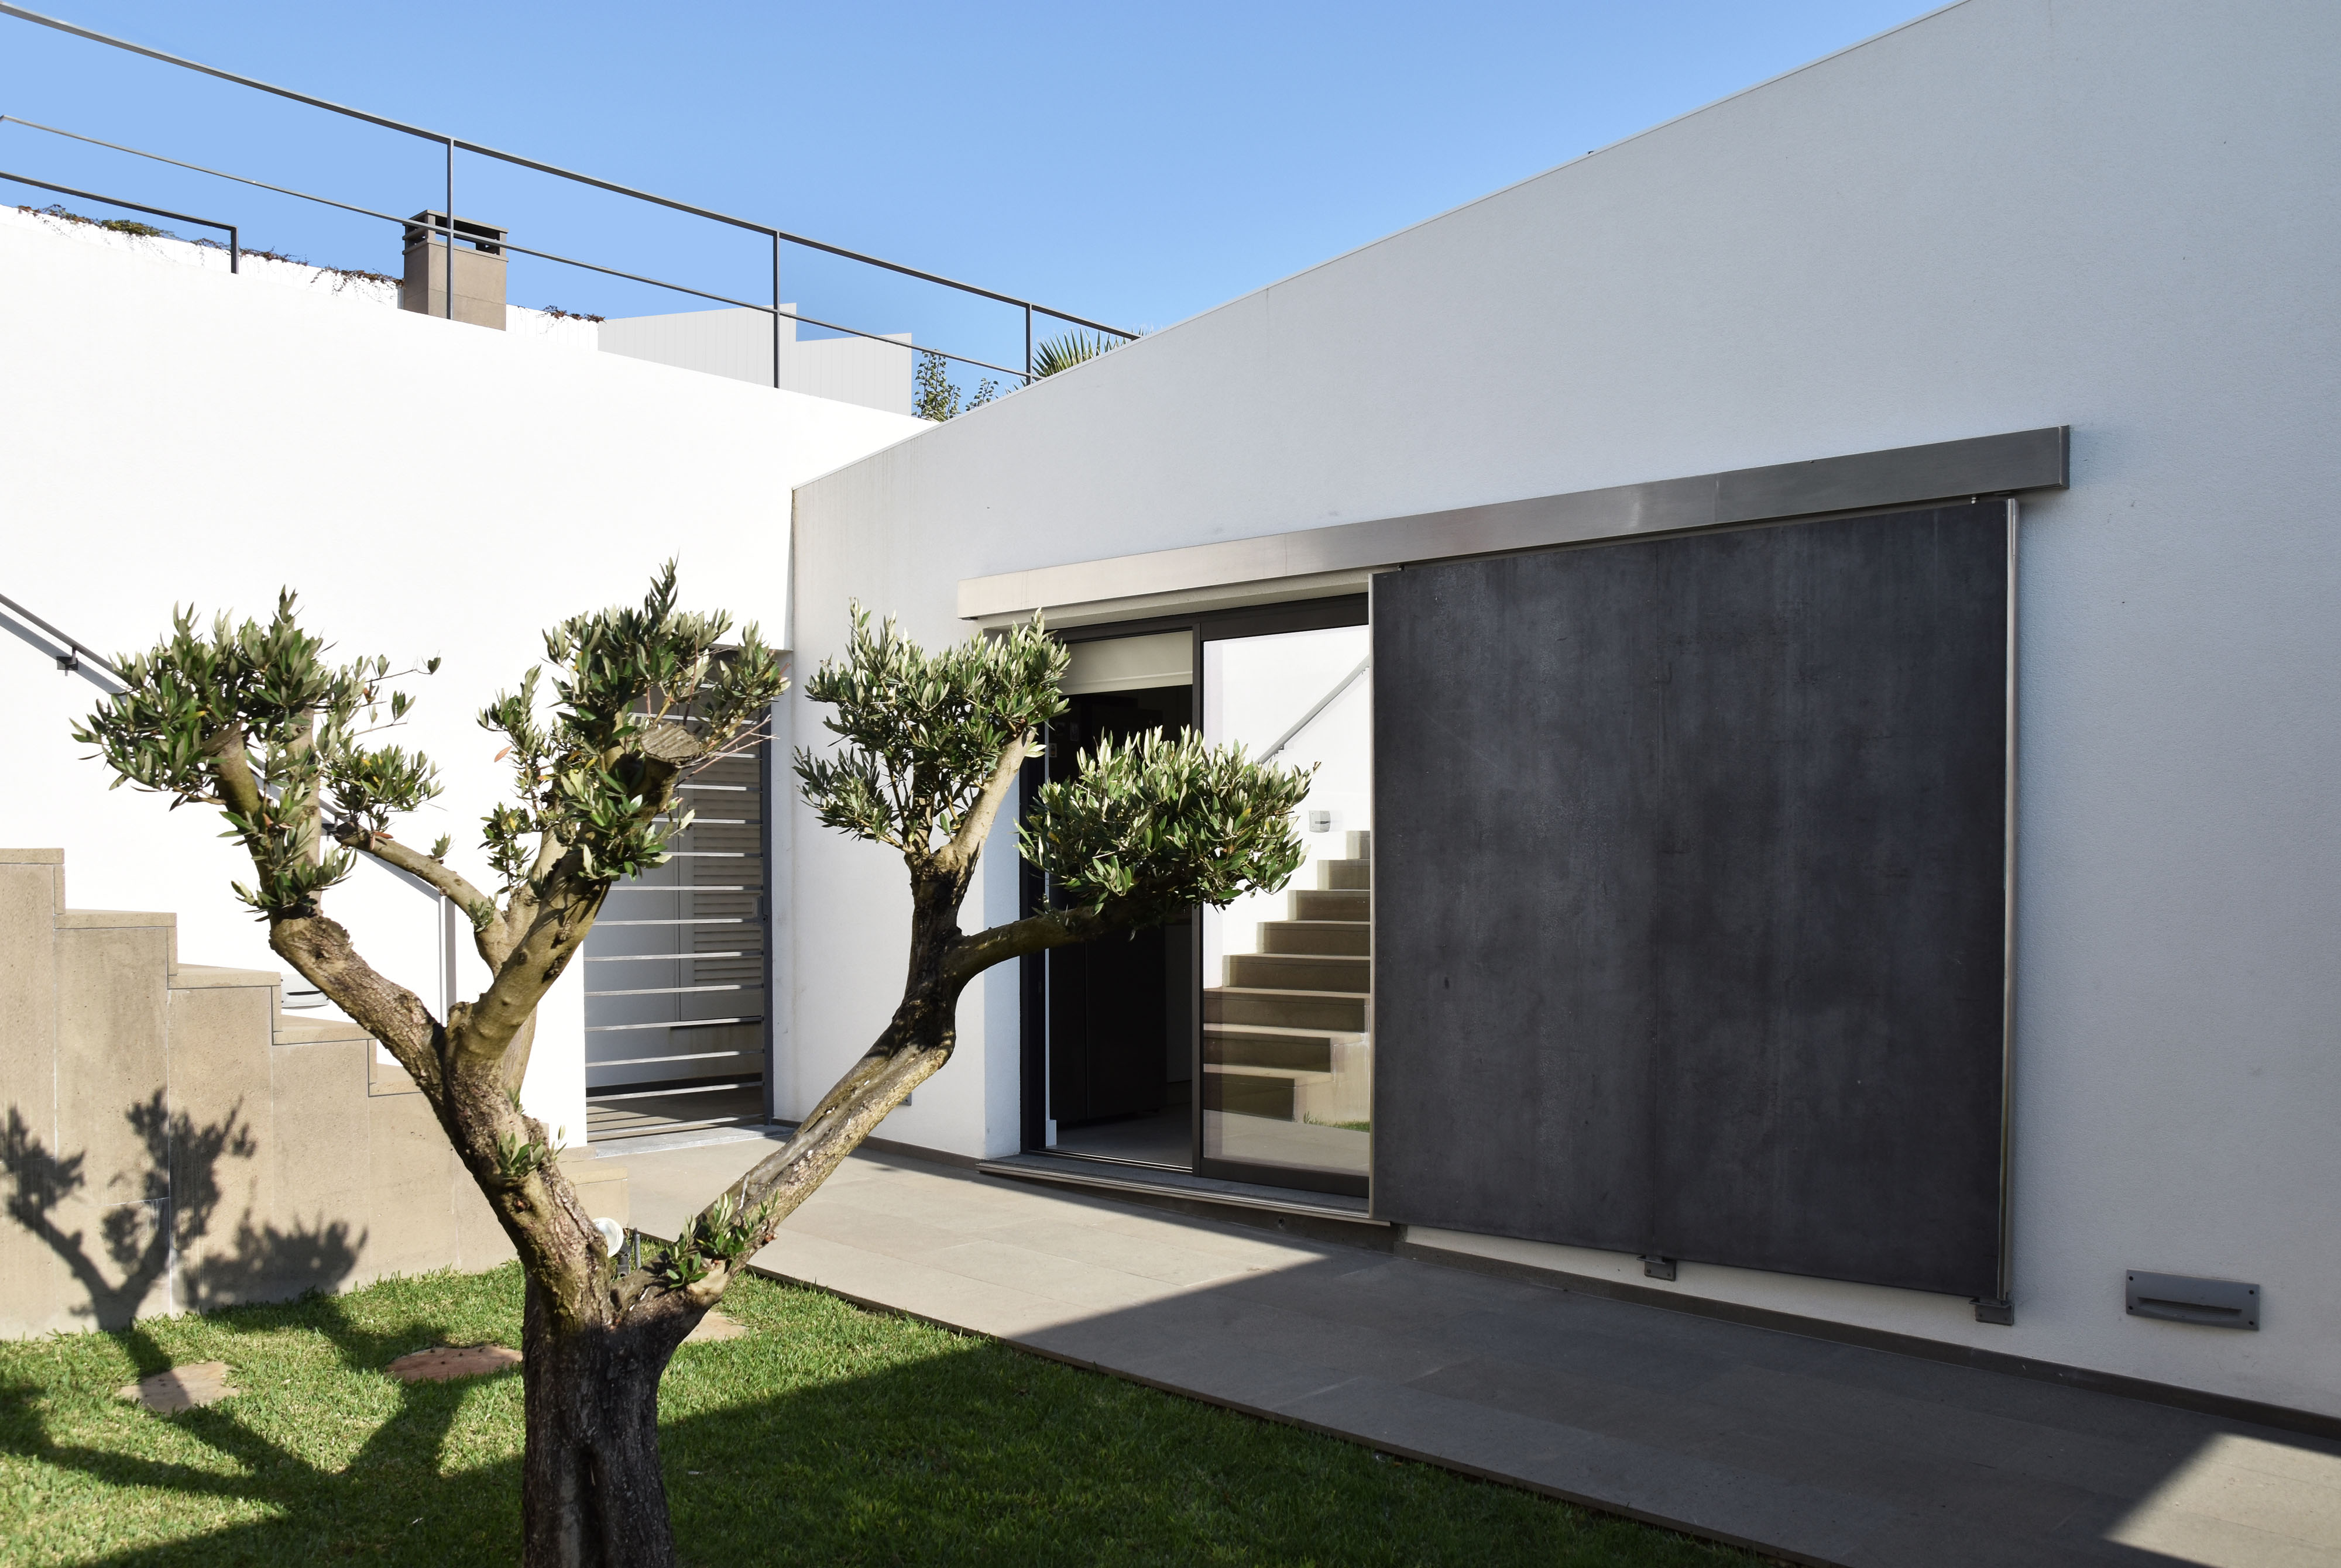 Casa EV Ericeira Lisboa Reabilitacao Casa Moradia Lisbon House Housing Refurbishment arquitectura architecture